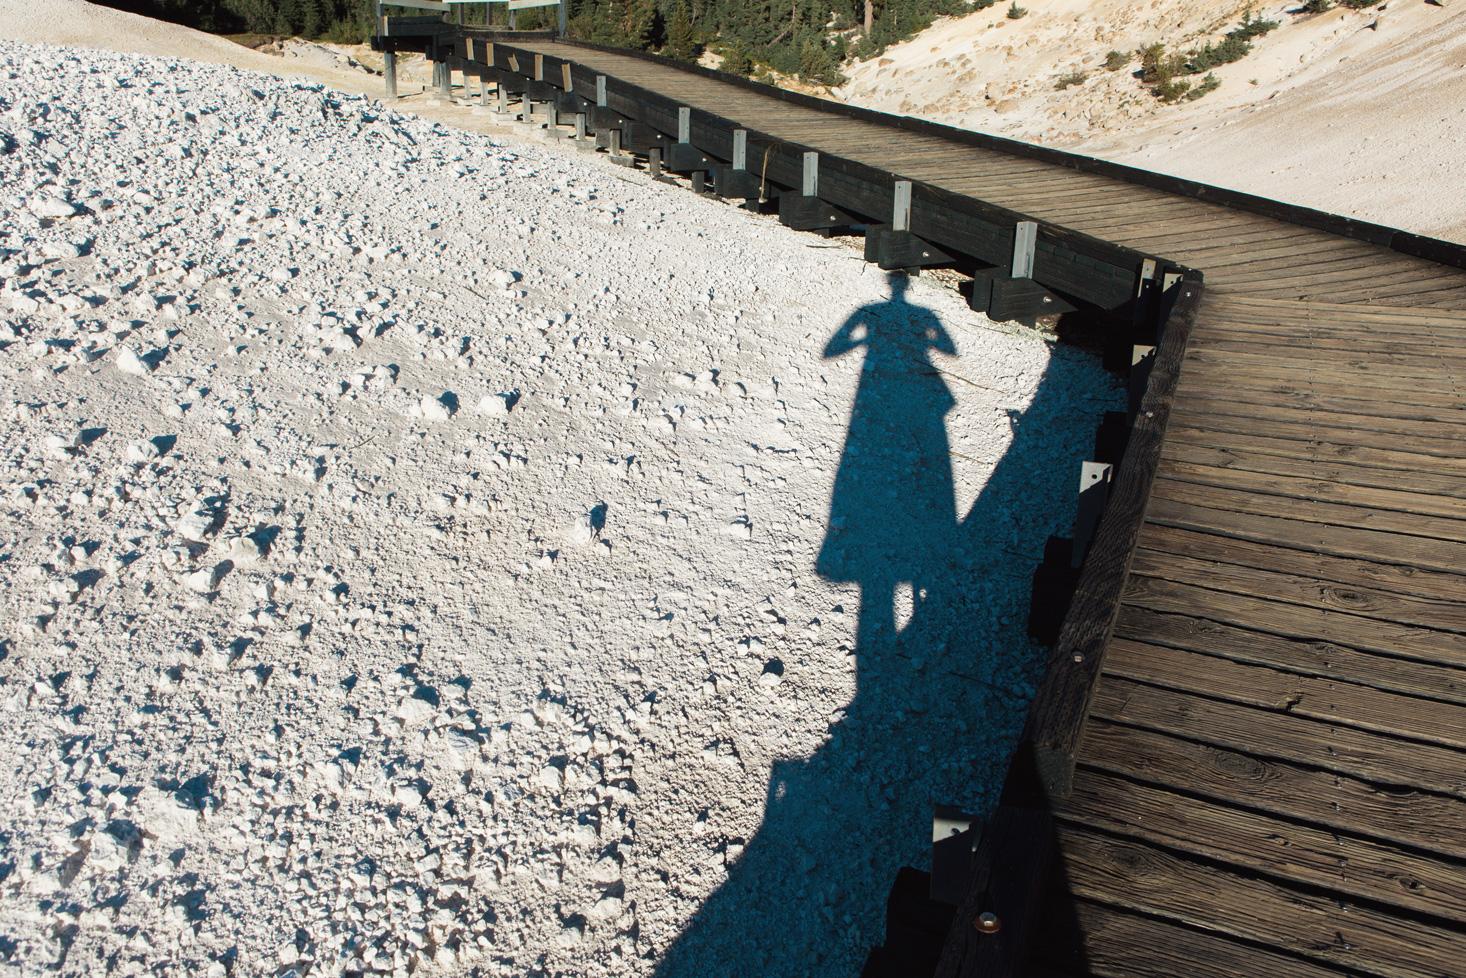 CindyGiovagnoli_Lassen_Volcanic_National_Park_California_camp_road_trip-016.jpg